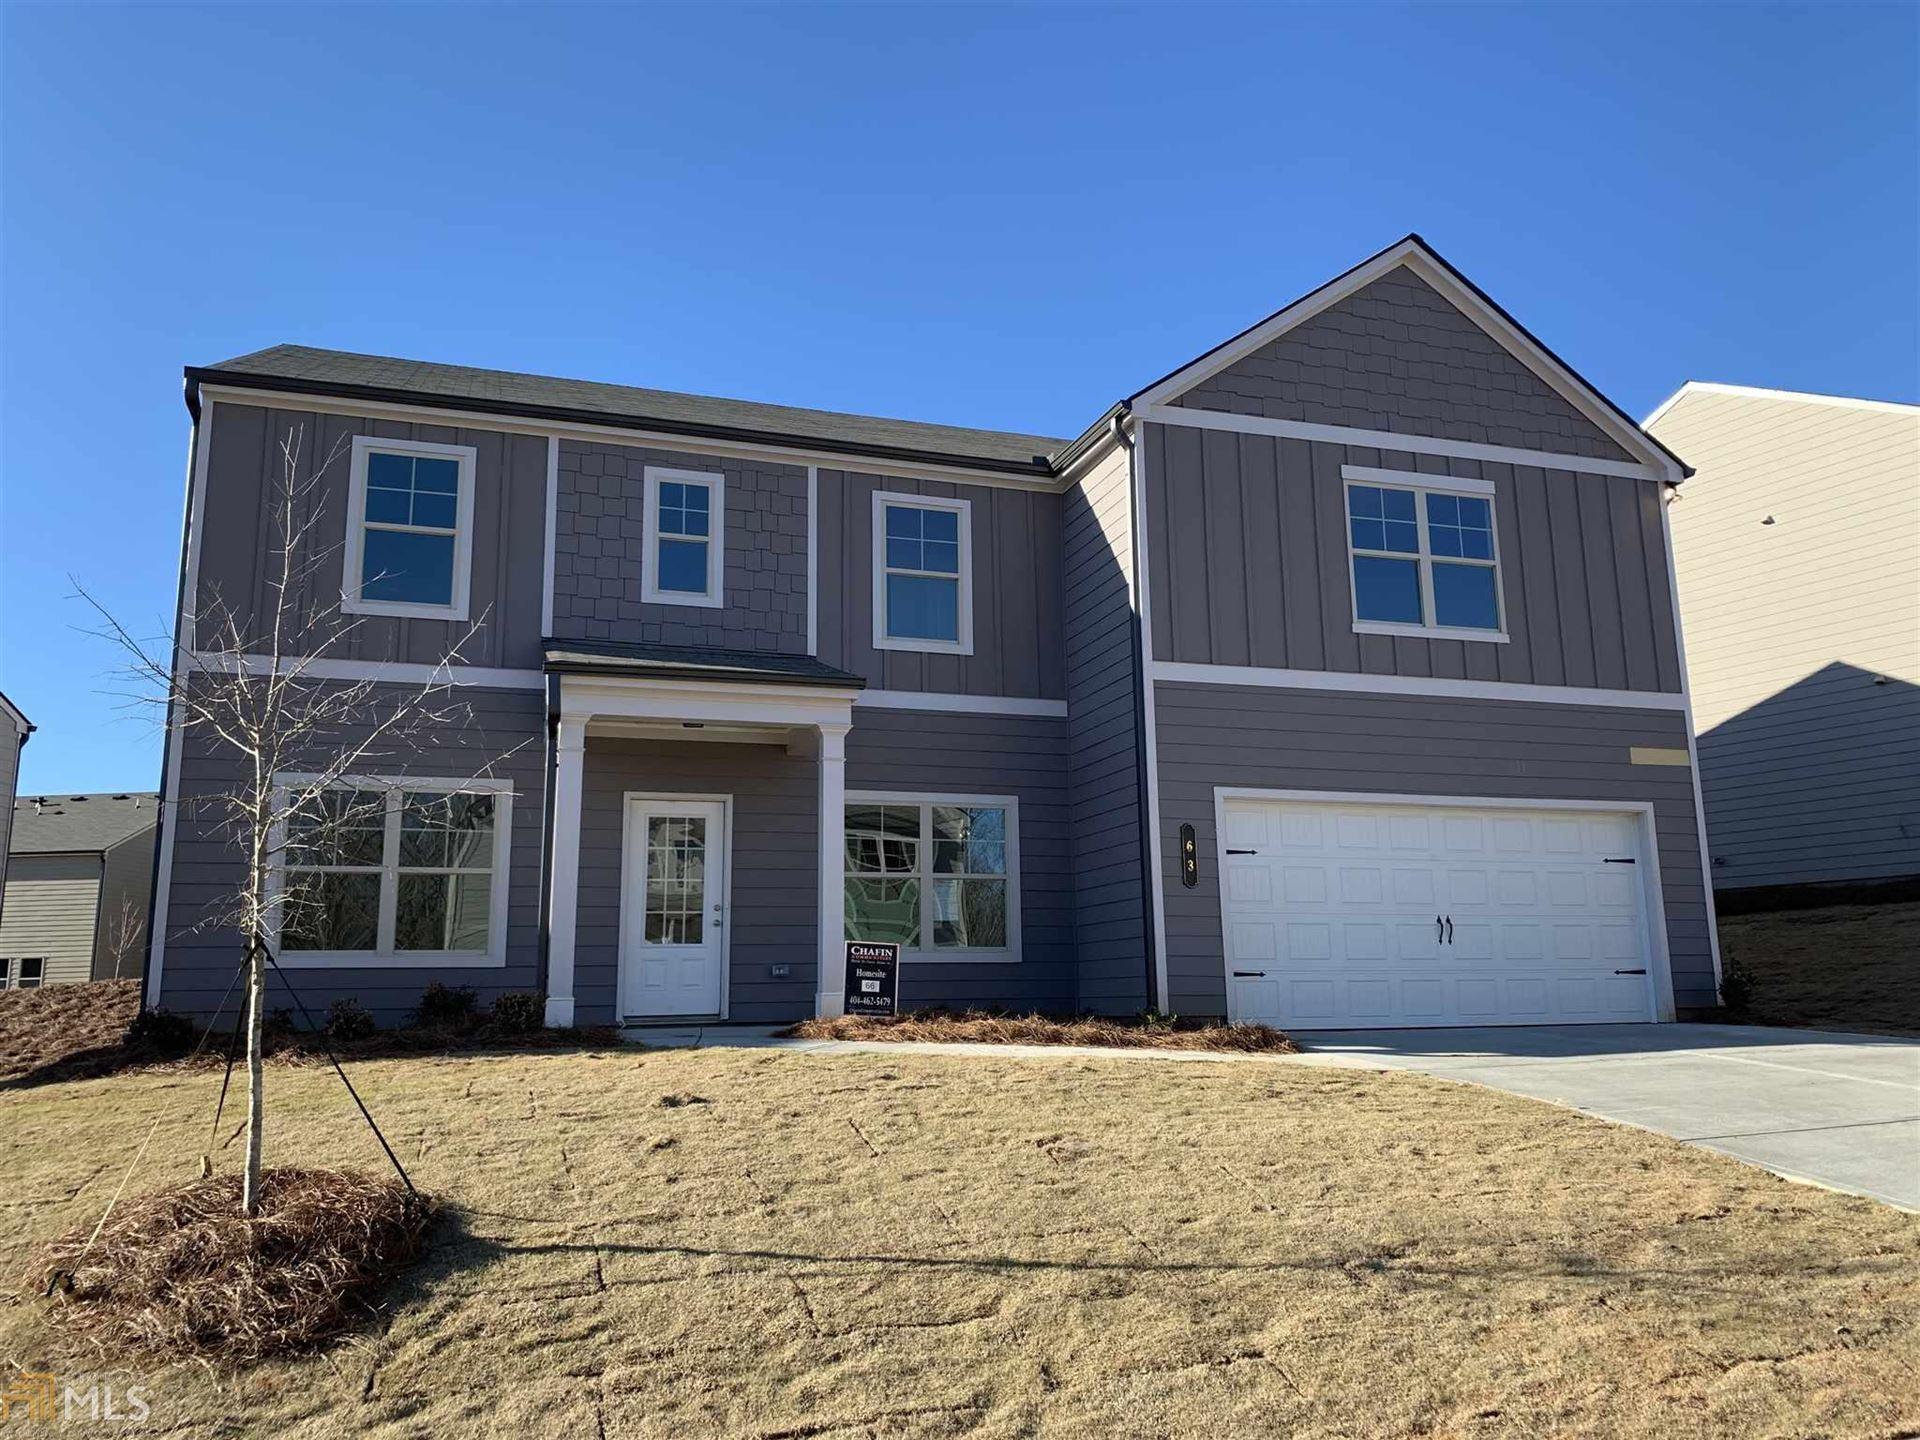 Photo for 63 Creekside Bluff Way, Auburn, GA 30011 (MLS # 8612989)